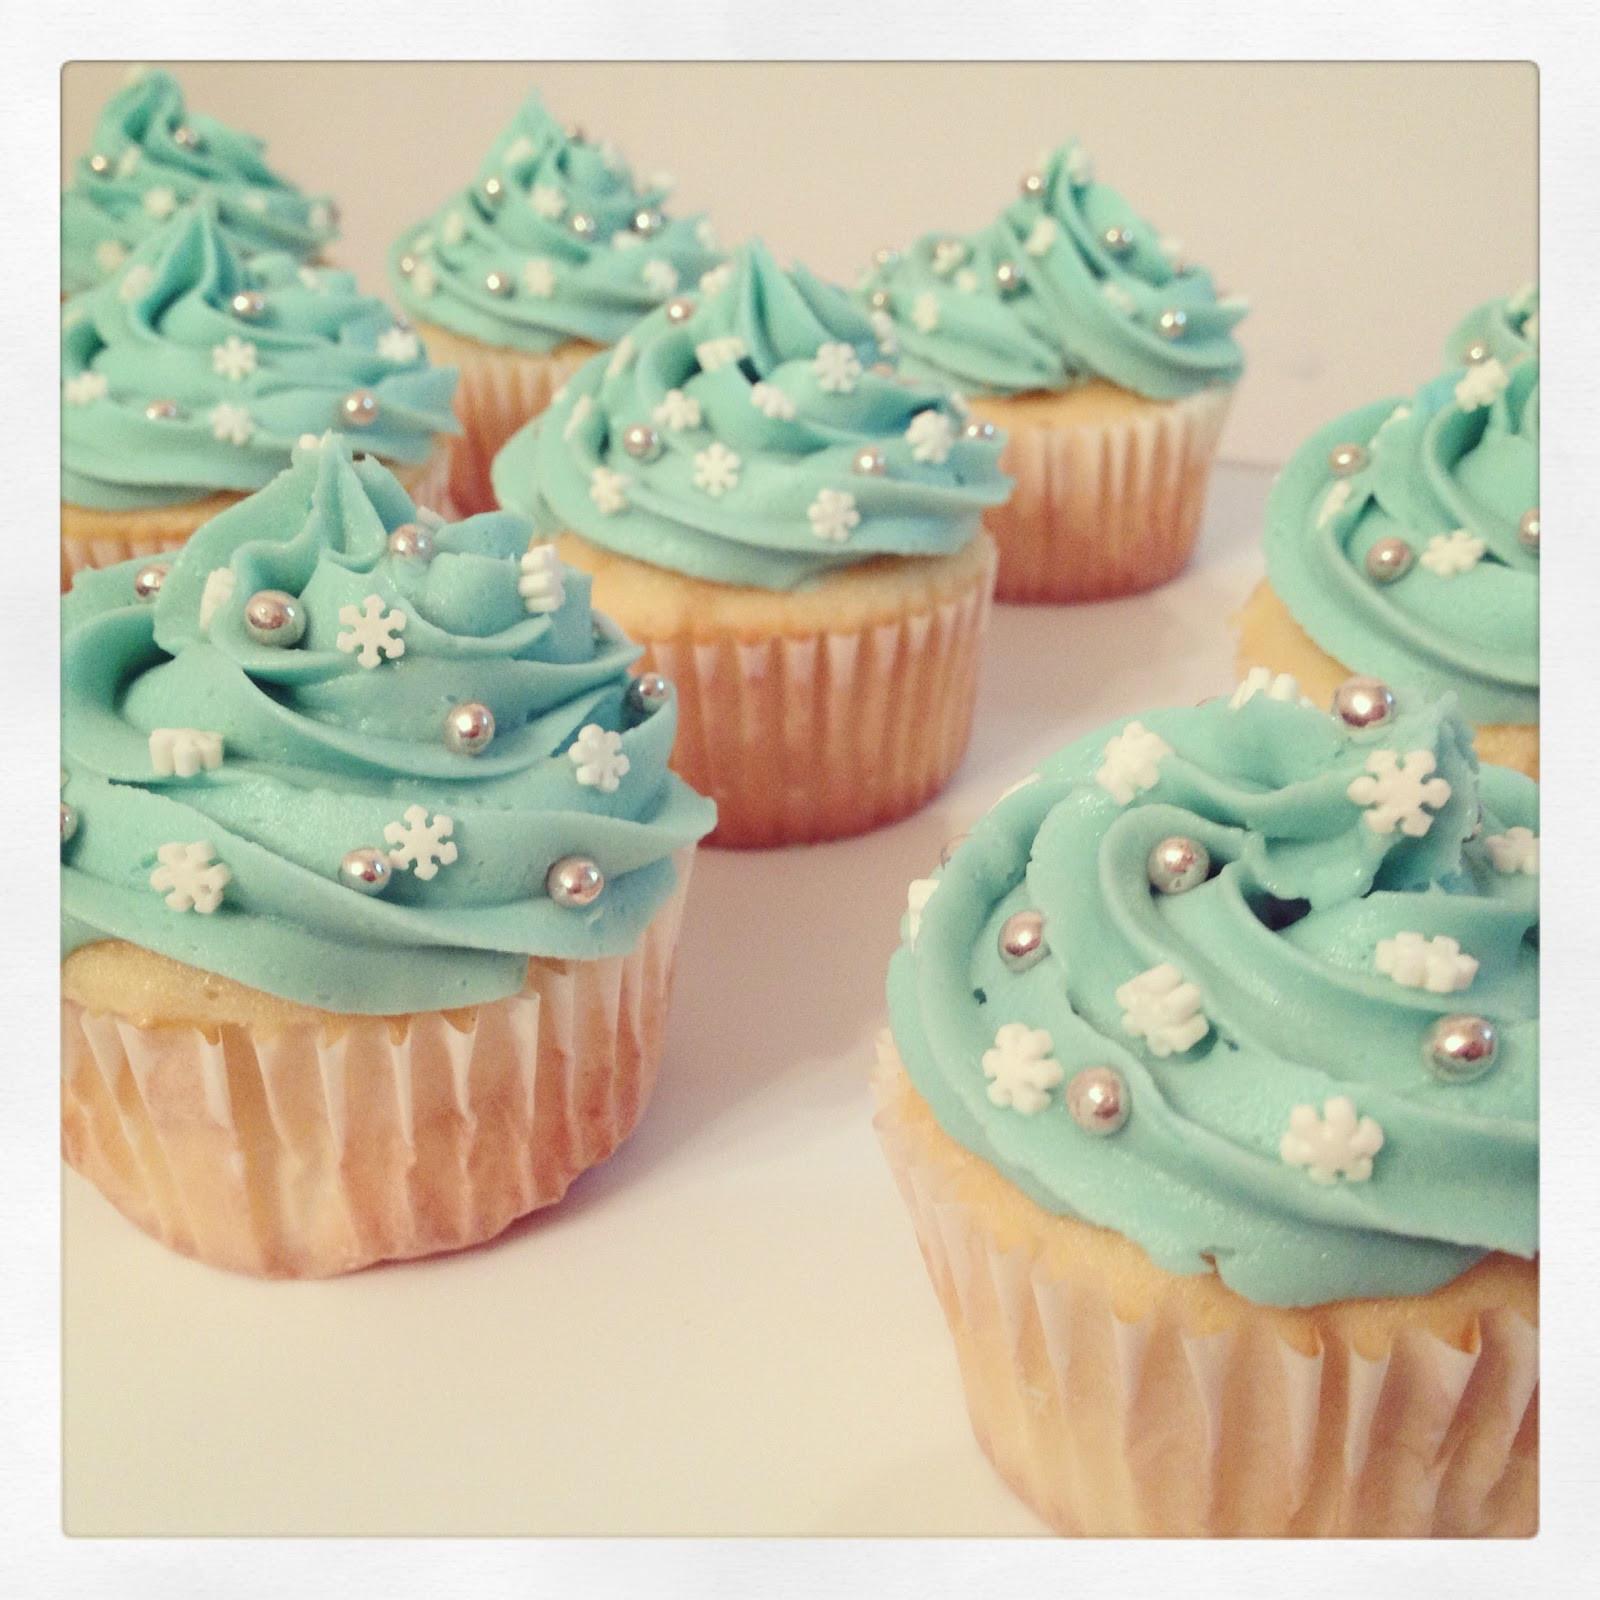 Winter Wonderland Cupcakes  Everything Candace Winter Wonderland Cupcakes